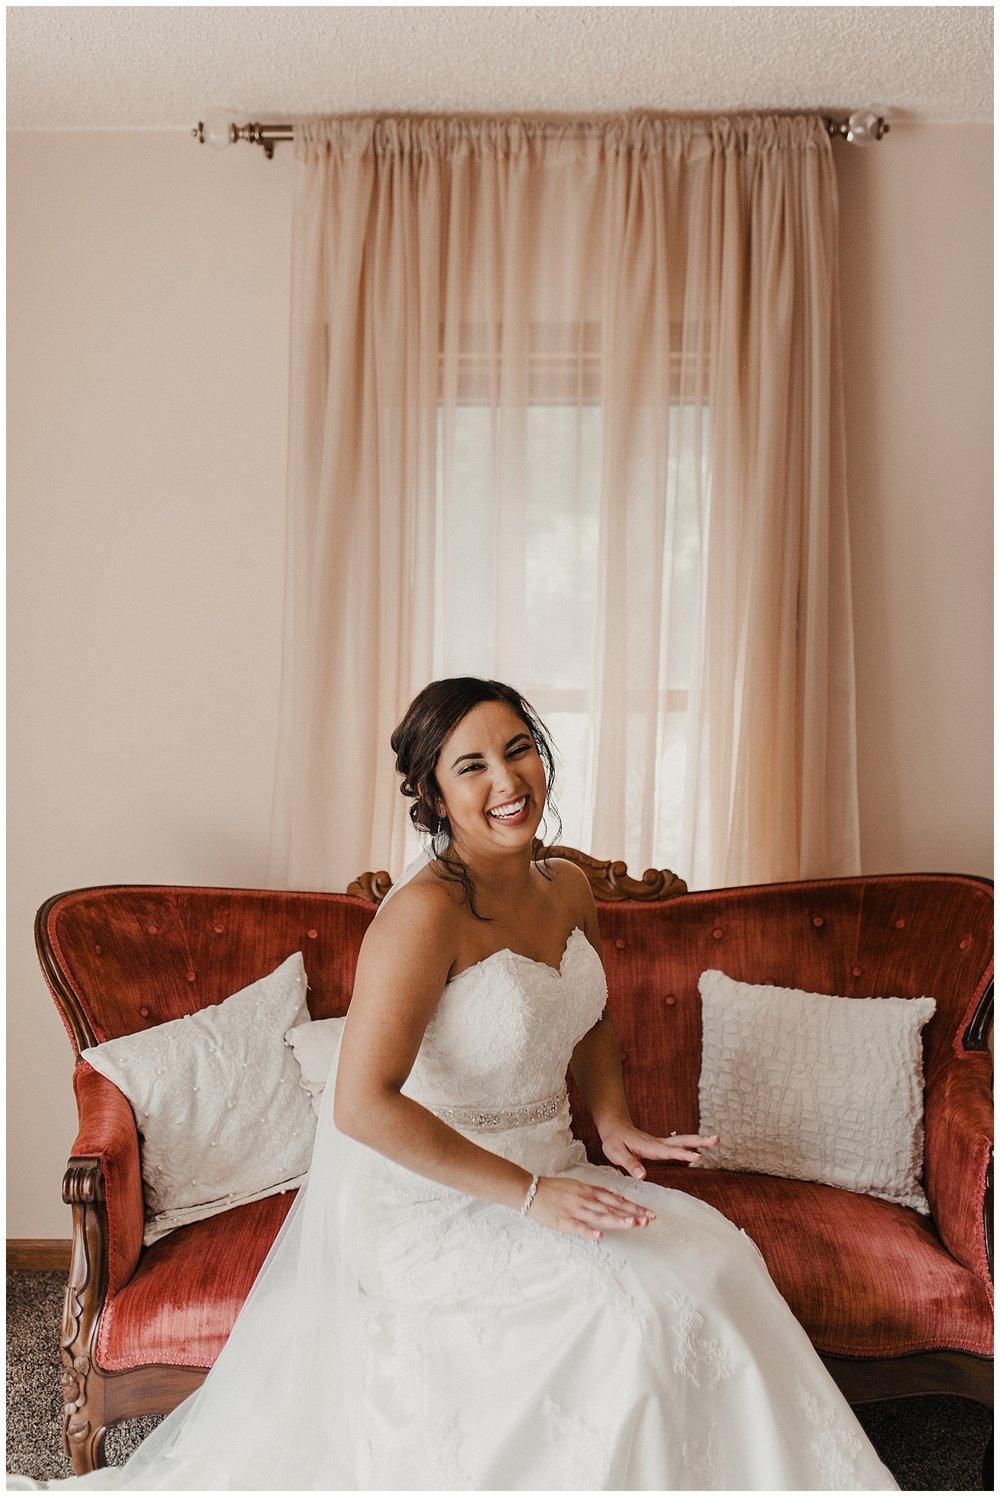 lindybeth photography - huisinga wedding - gable hill - blog-122.jpg